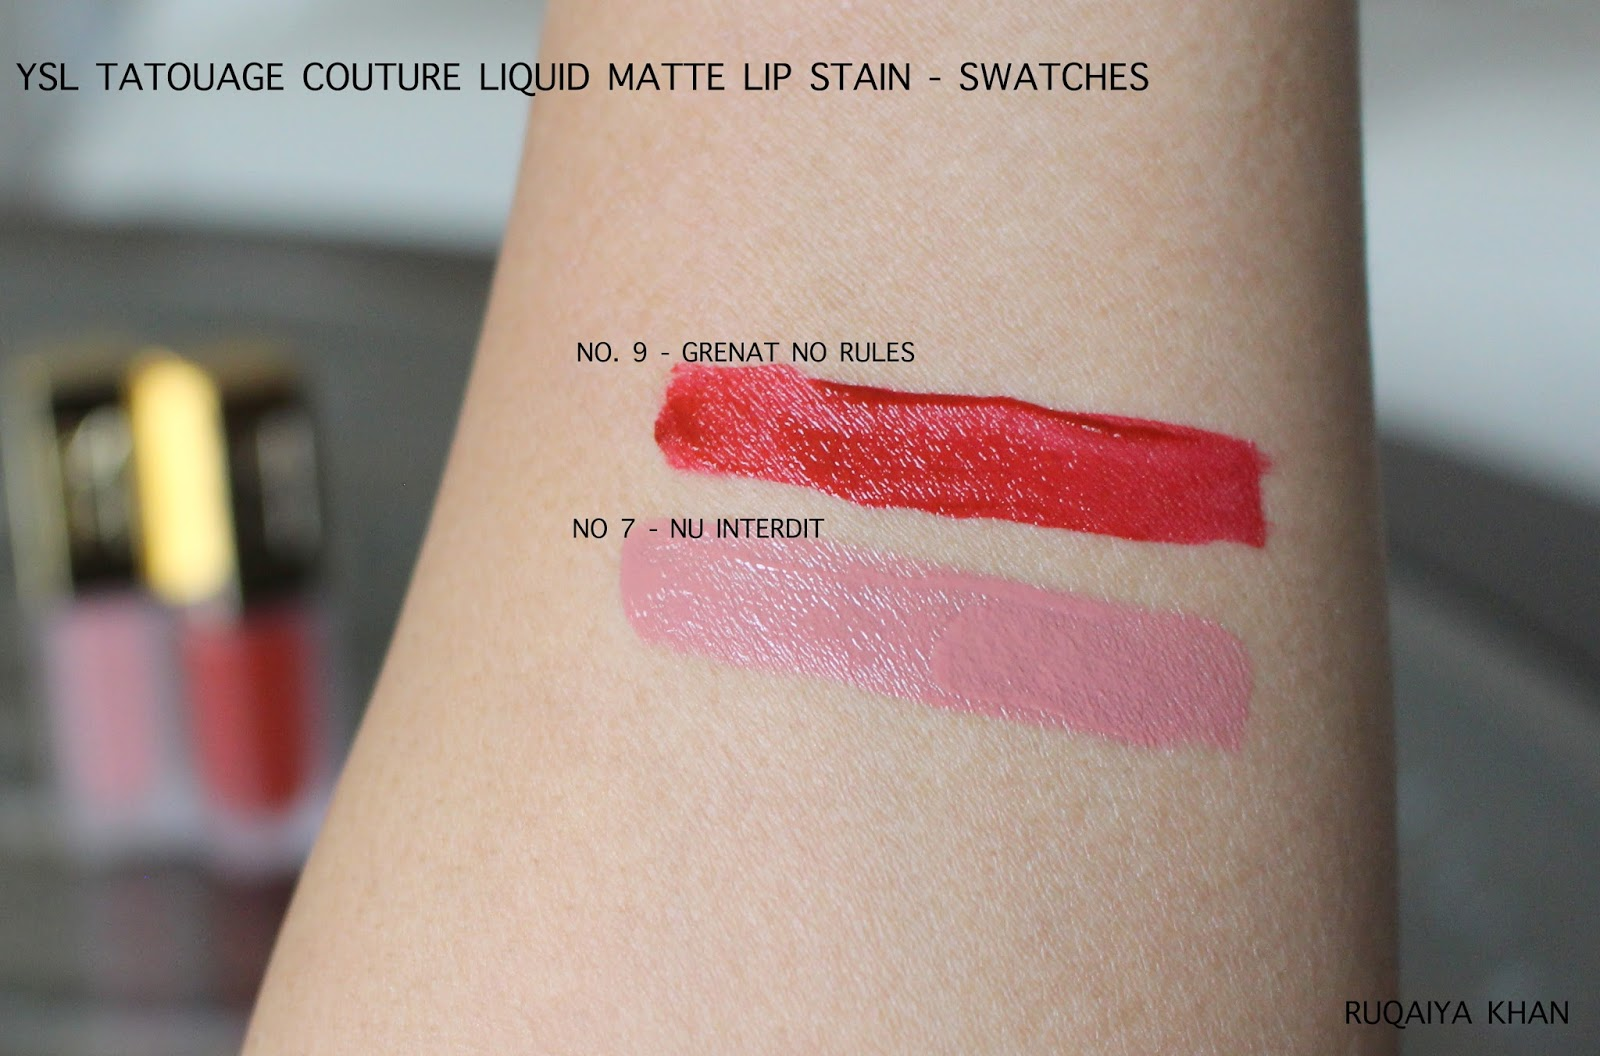 Ruqaiya Khan Ysl Tatouage Couture Liquid Matte Lip Stain